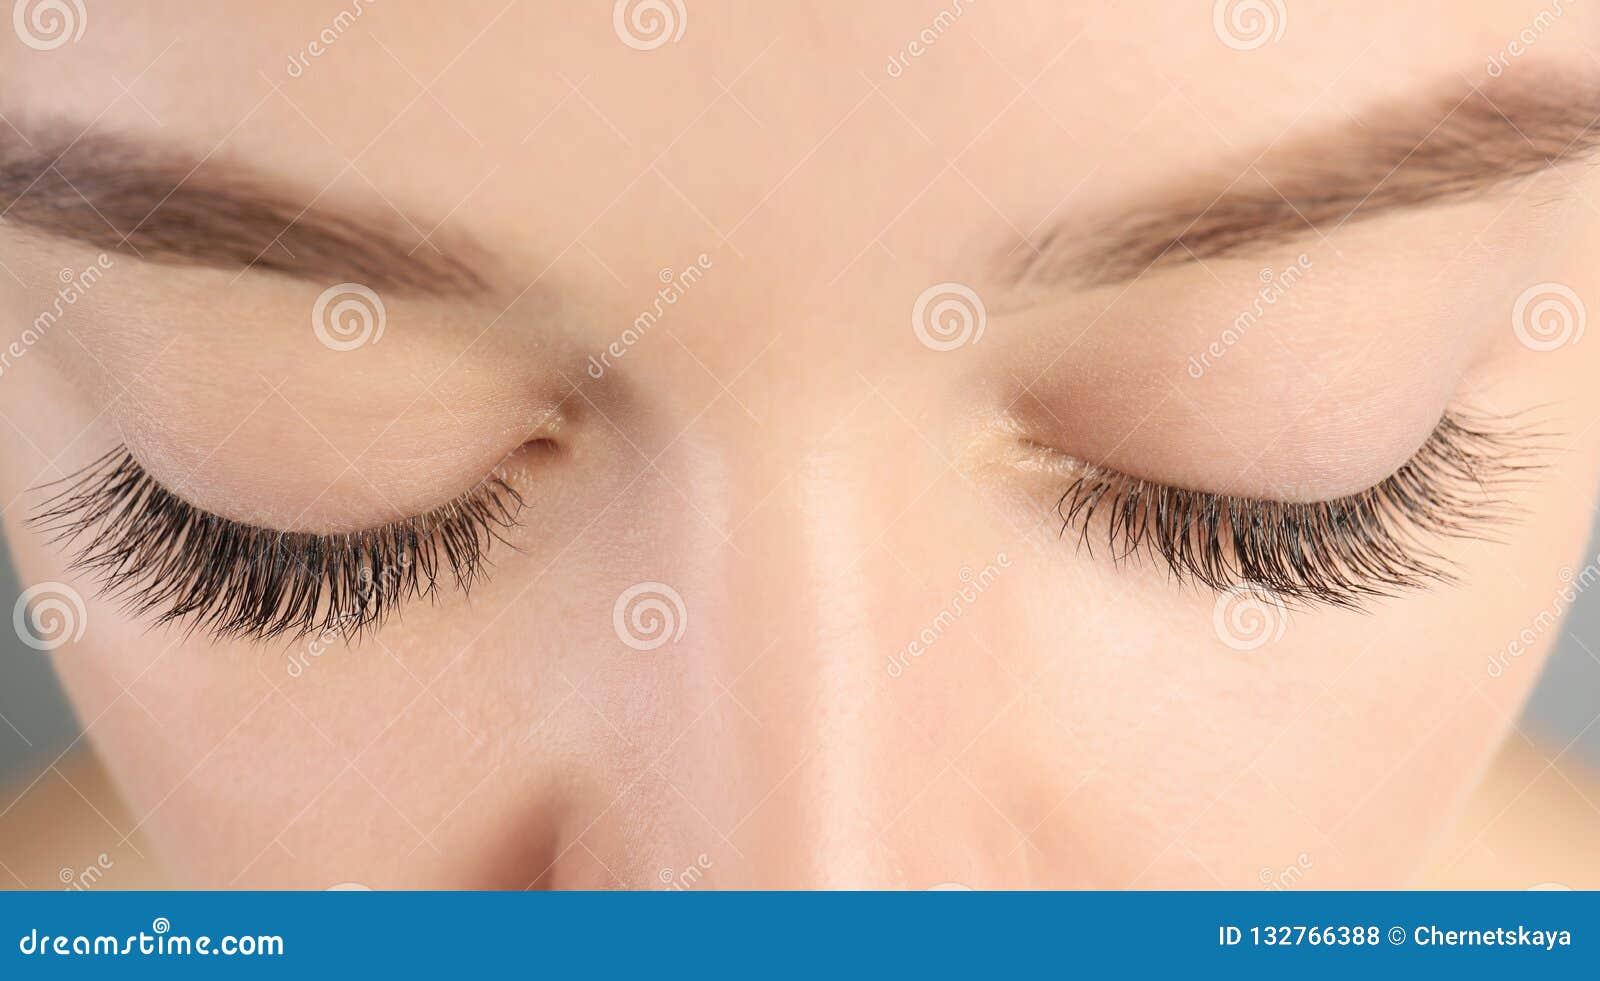 Young woman with beautiful long eyelashes, closeup